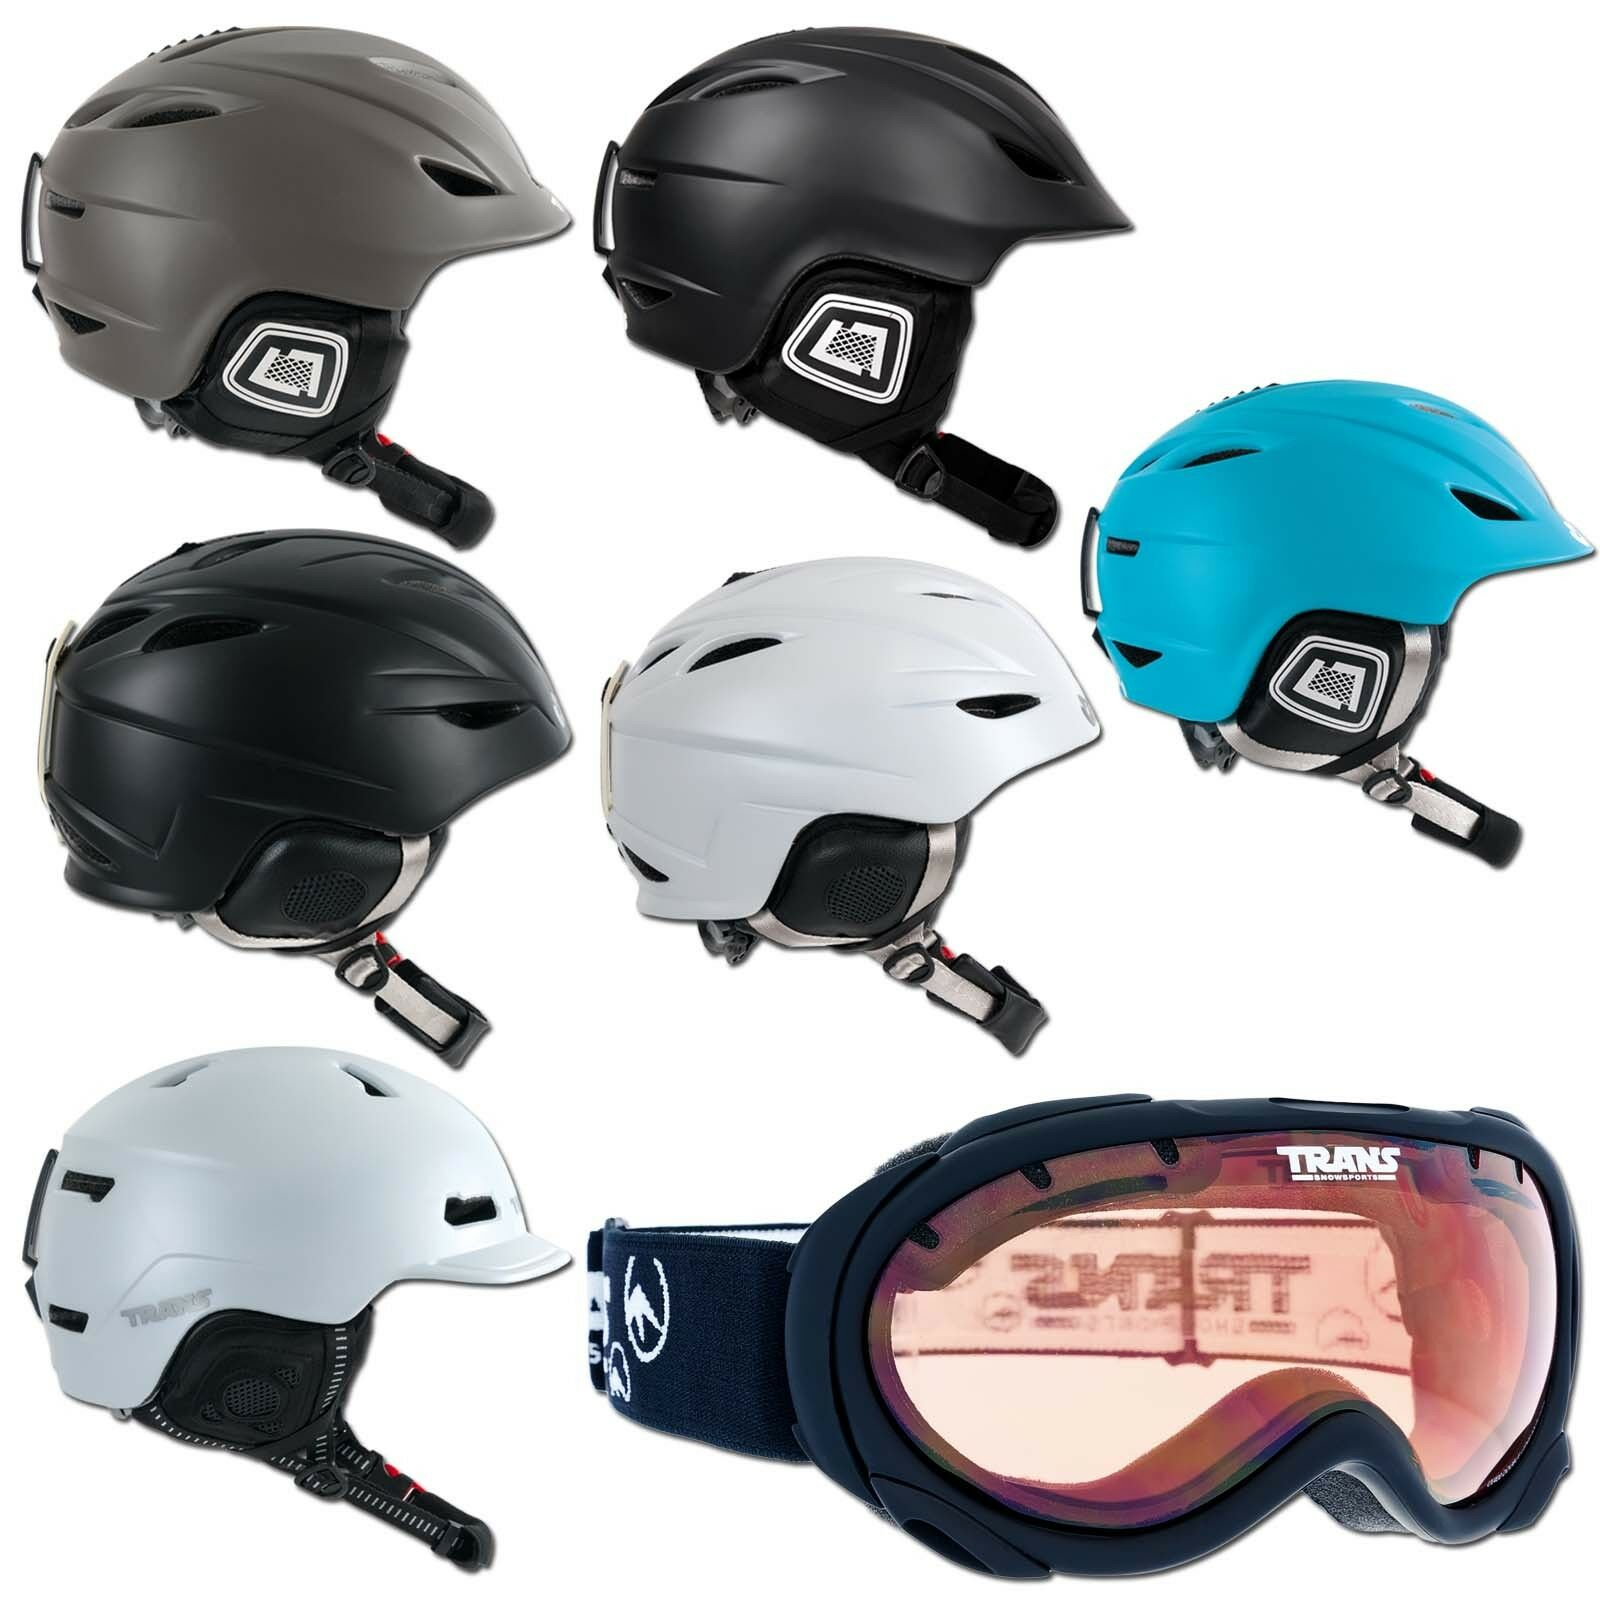 Men's & Women's Ski & Snowboard Helmet Trans 900 1200 1500  S M L XL + Glasses